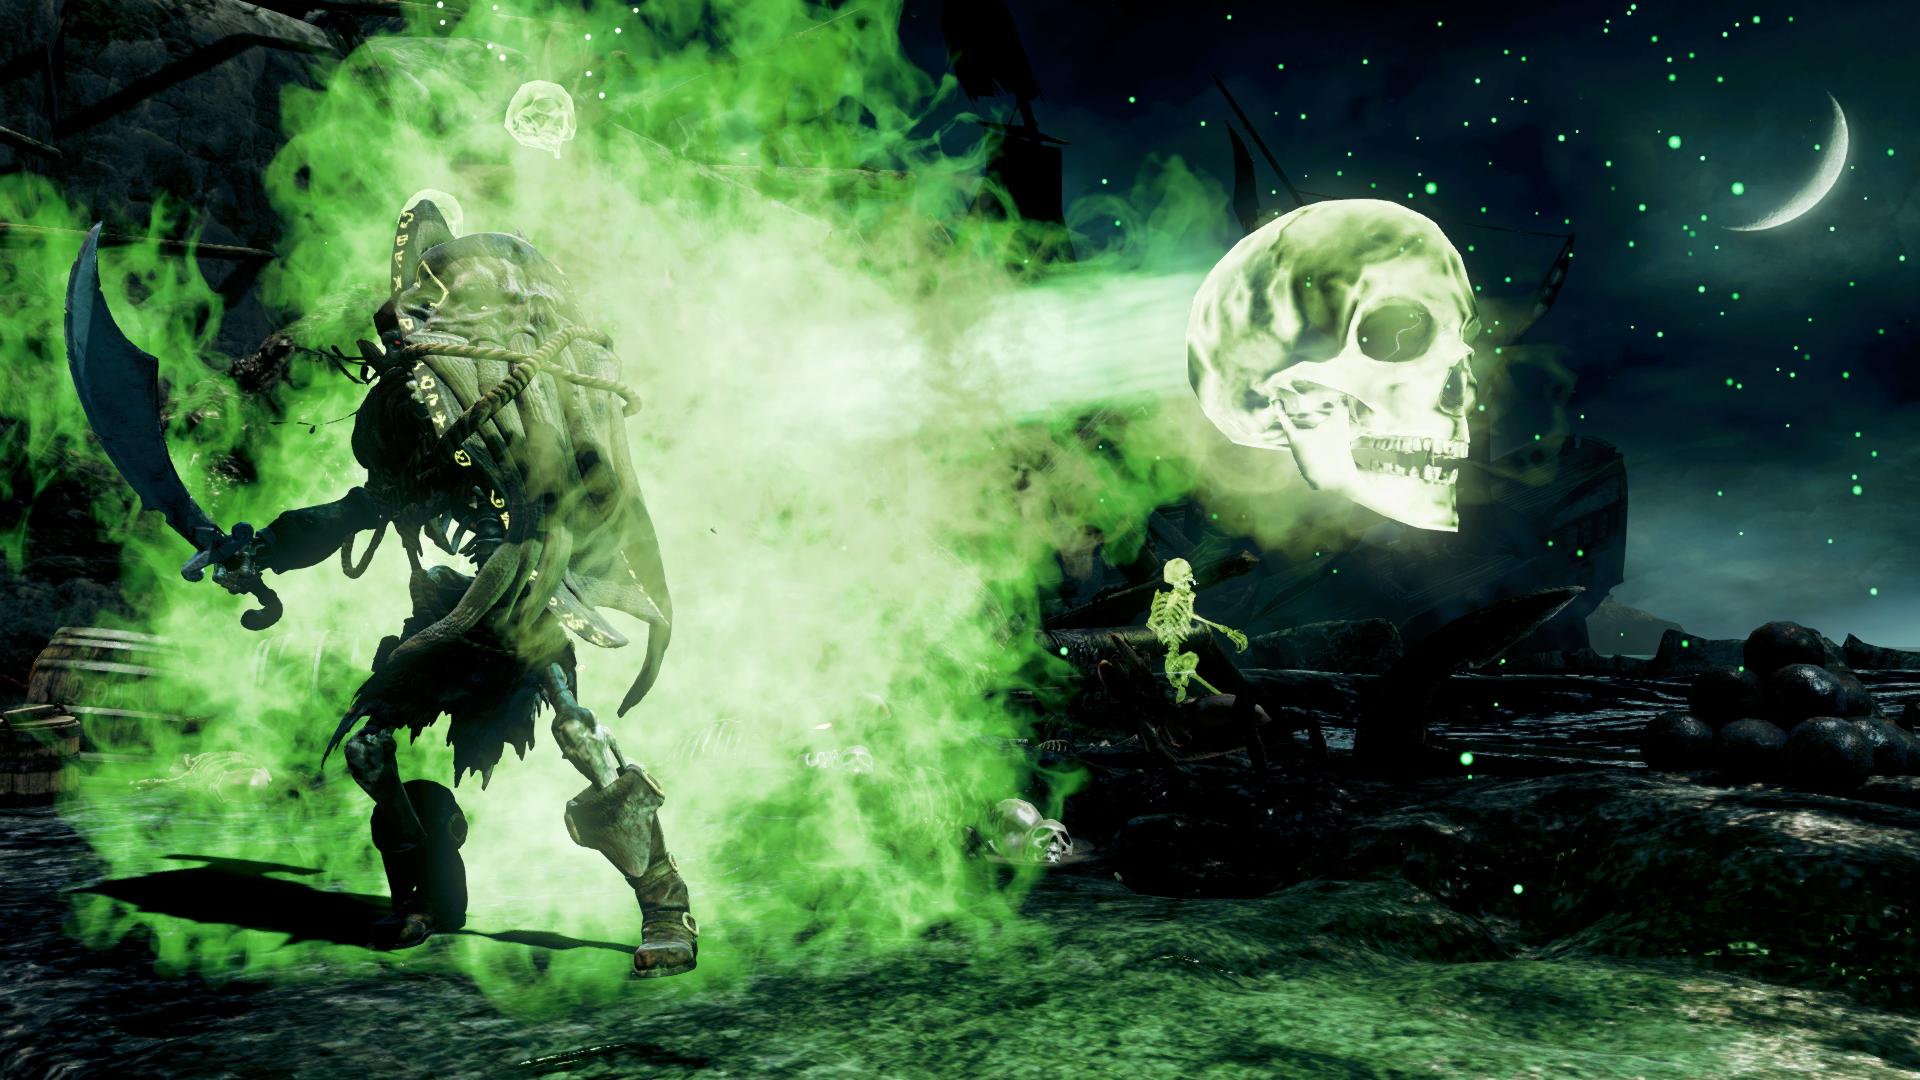 Spinal's Searing Skull